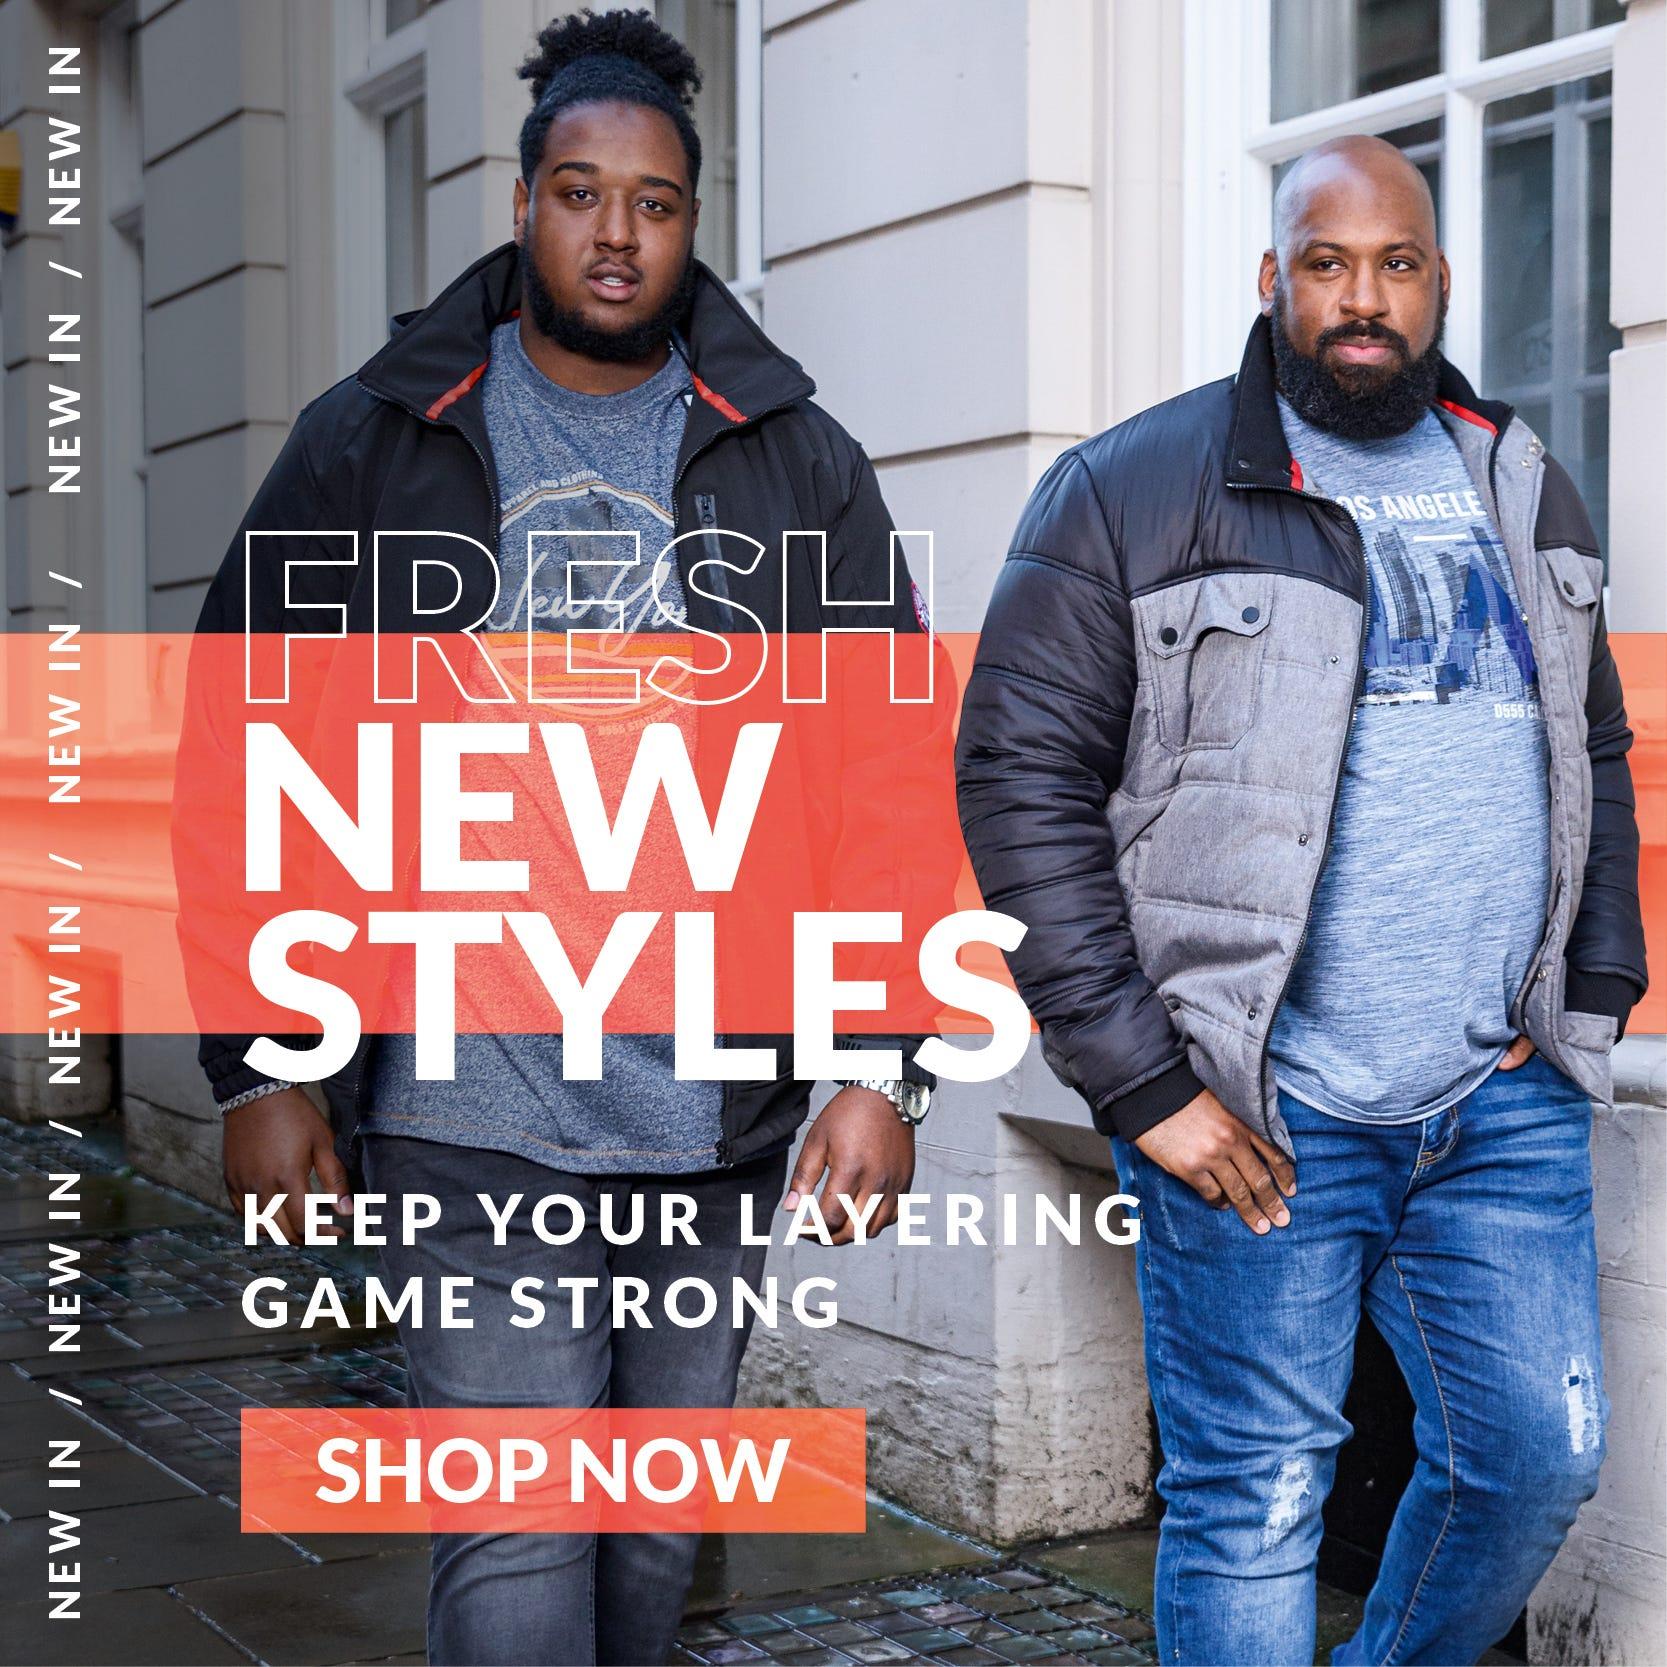 Big Clothing 4 U - Fresh New Styles